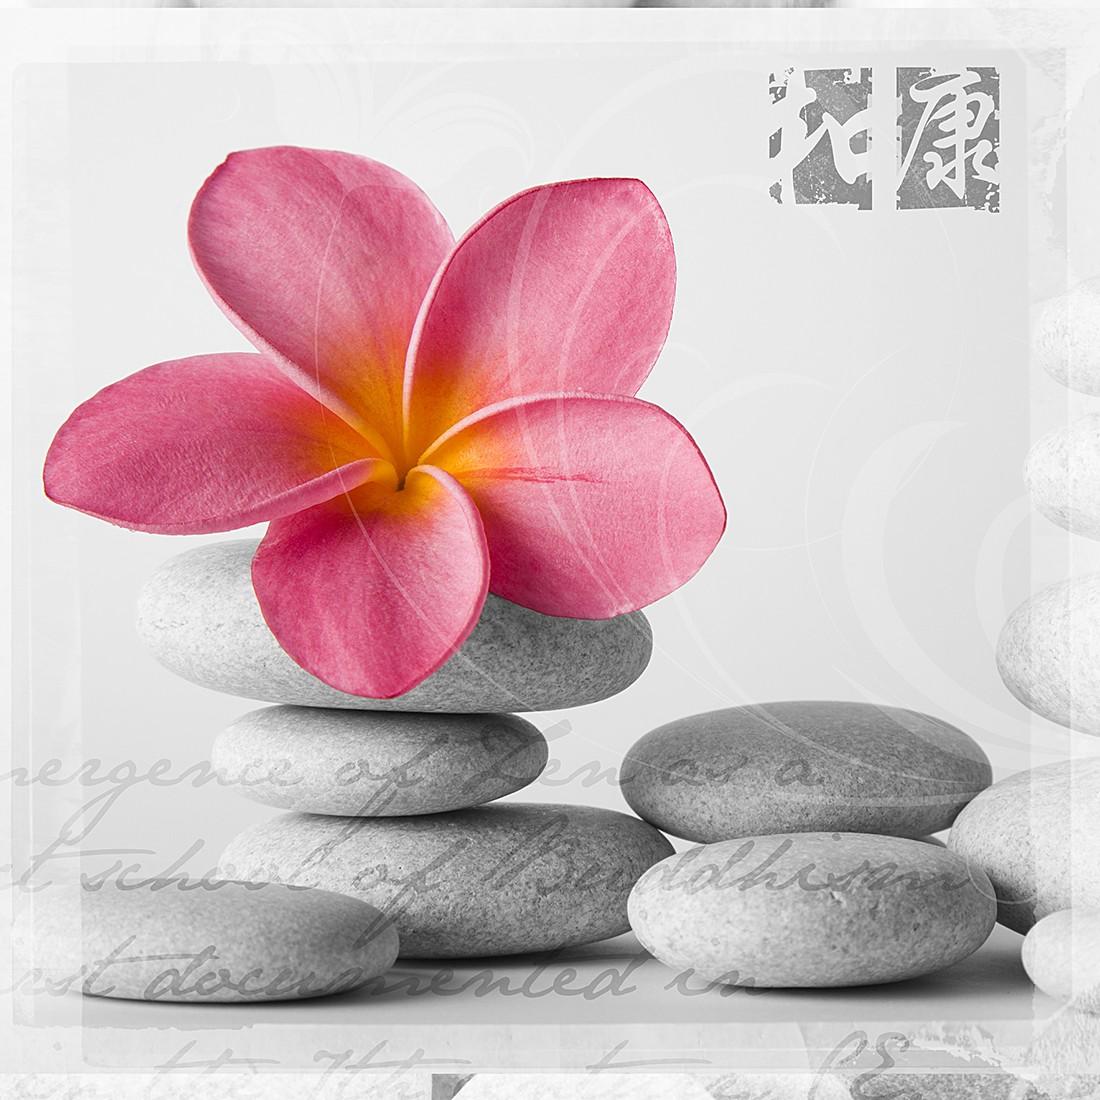 Glasbild Frangipani Pink II 20×20, Pro Art online bestellen